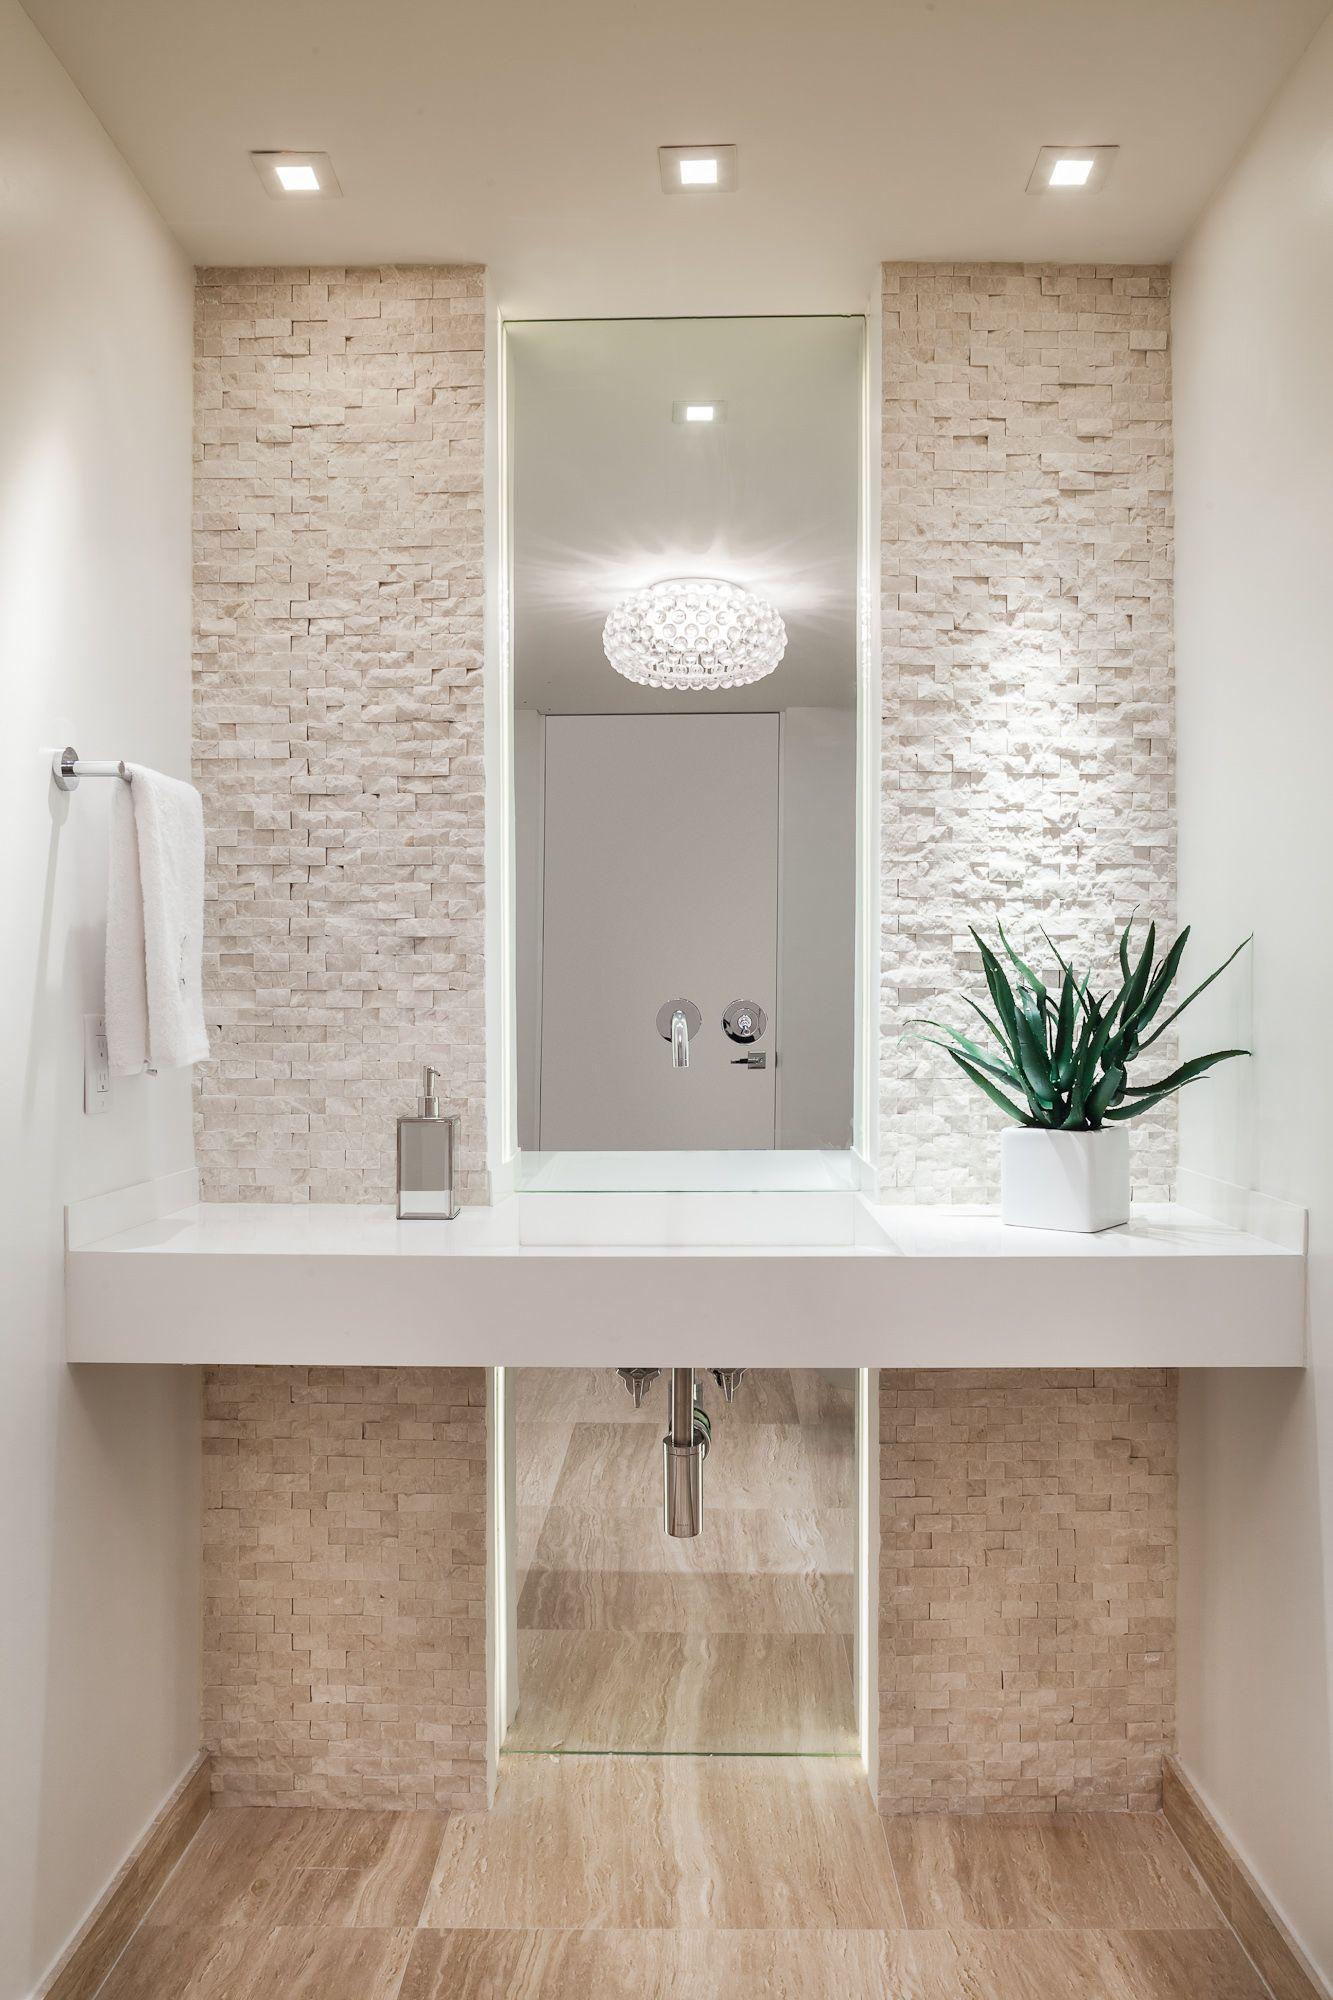 Project by 2id interiors - South Beach   Amazing powder room. Simply elegant. Mirror, stone walls, LED lighting, Travertine Floor.